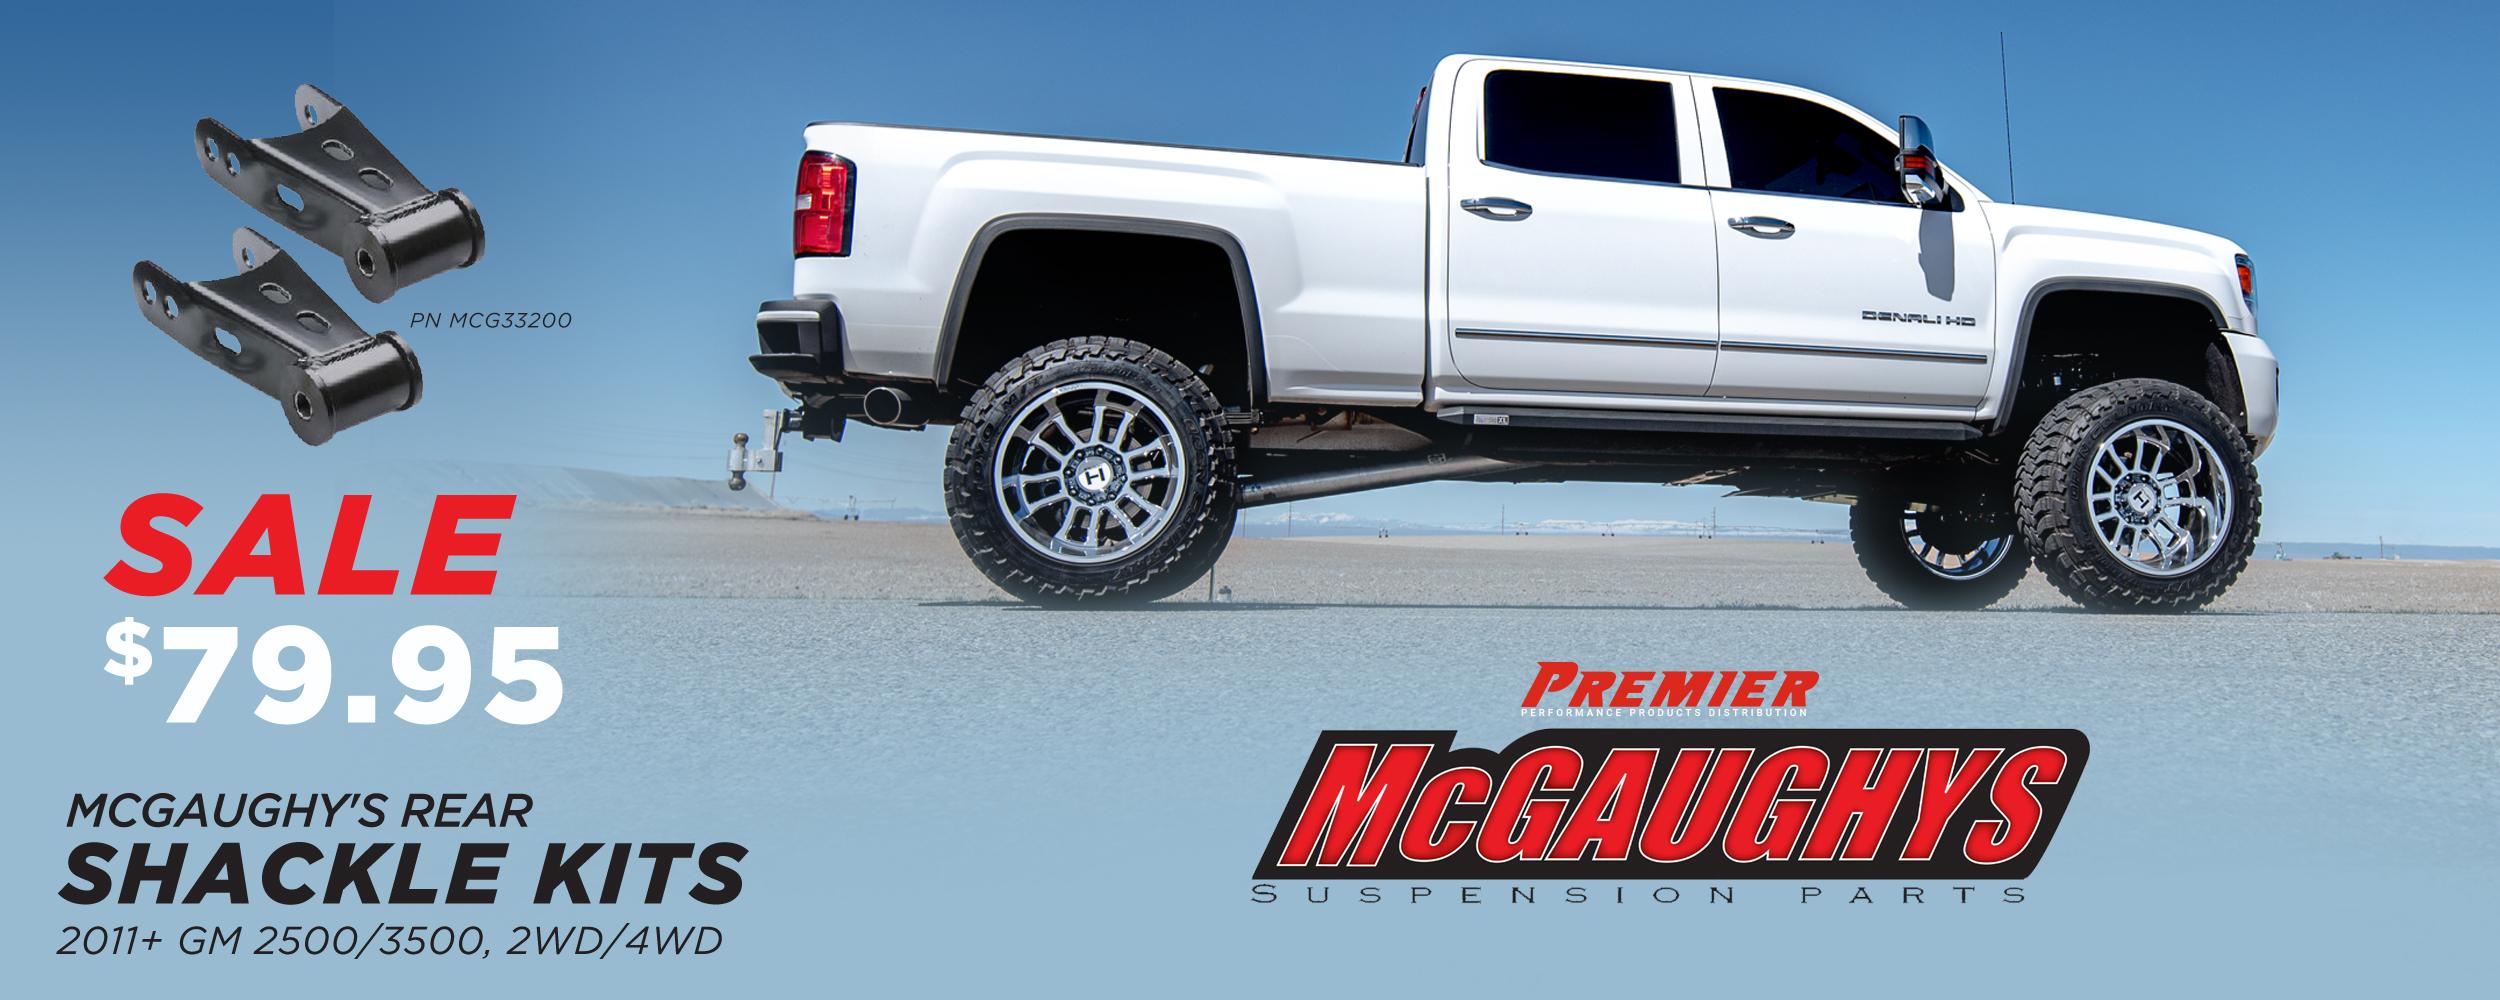 Mcgaughys1